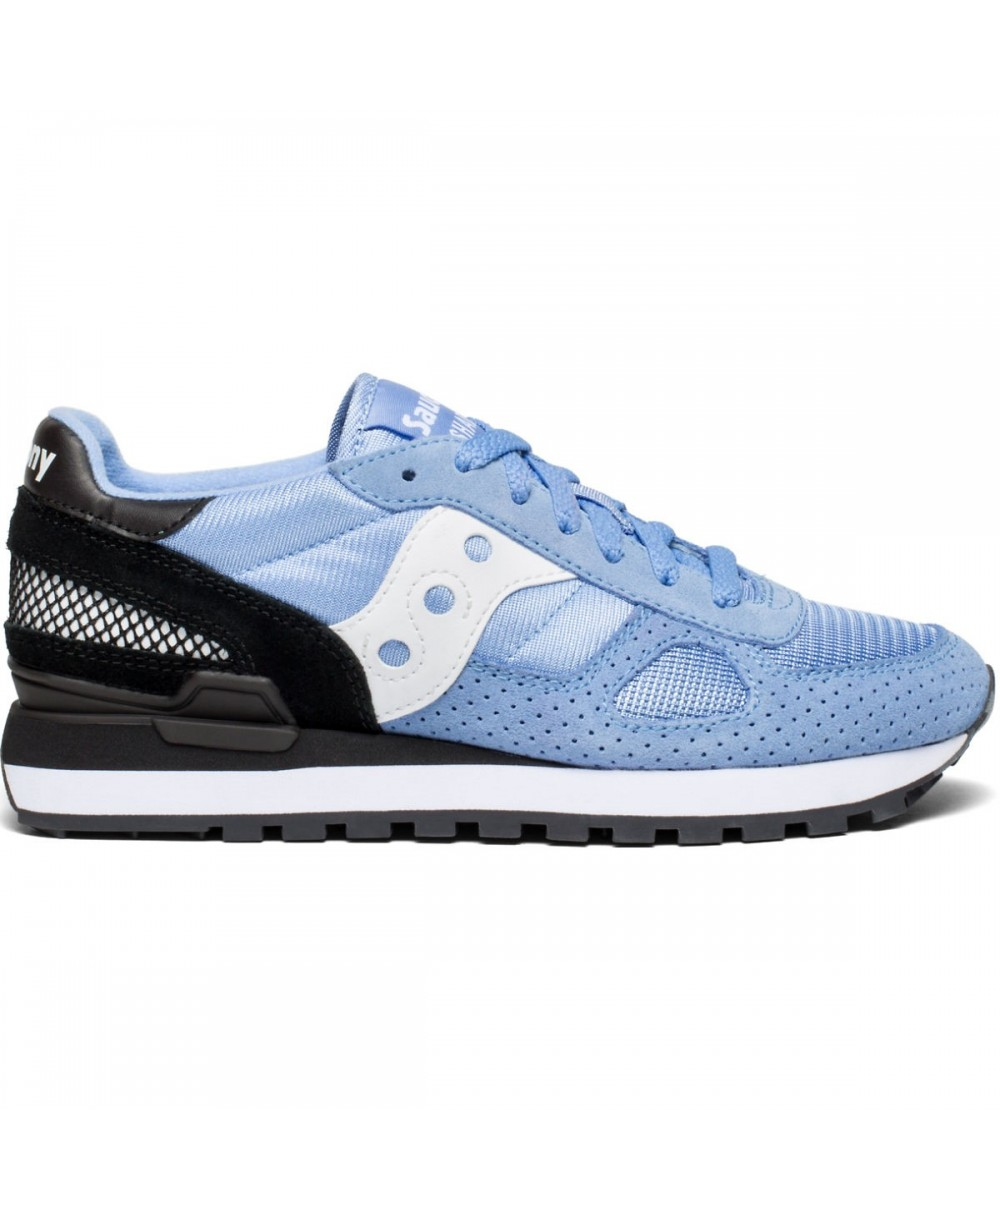 d6c7f4dd Saucony Shadow Original Zapatos Sneakers para Mujer Blue/Black